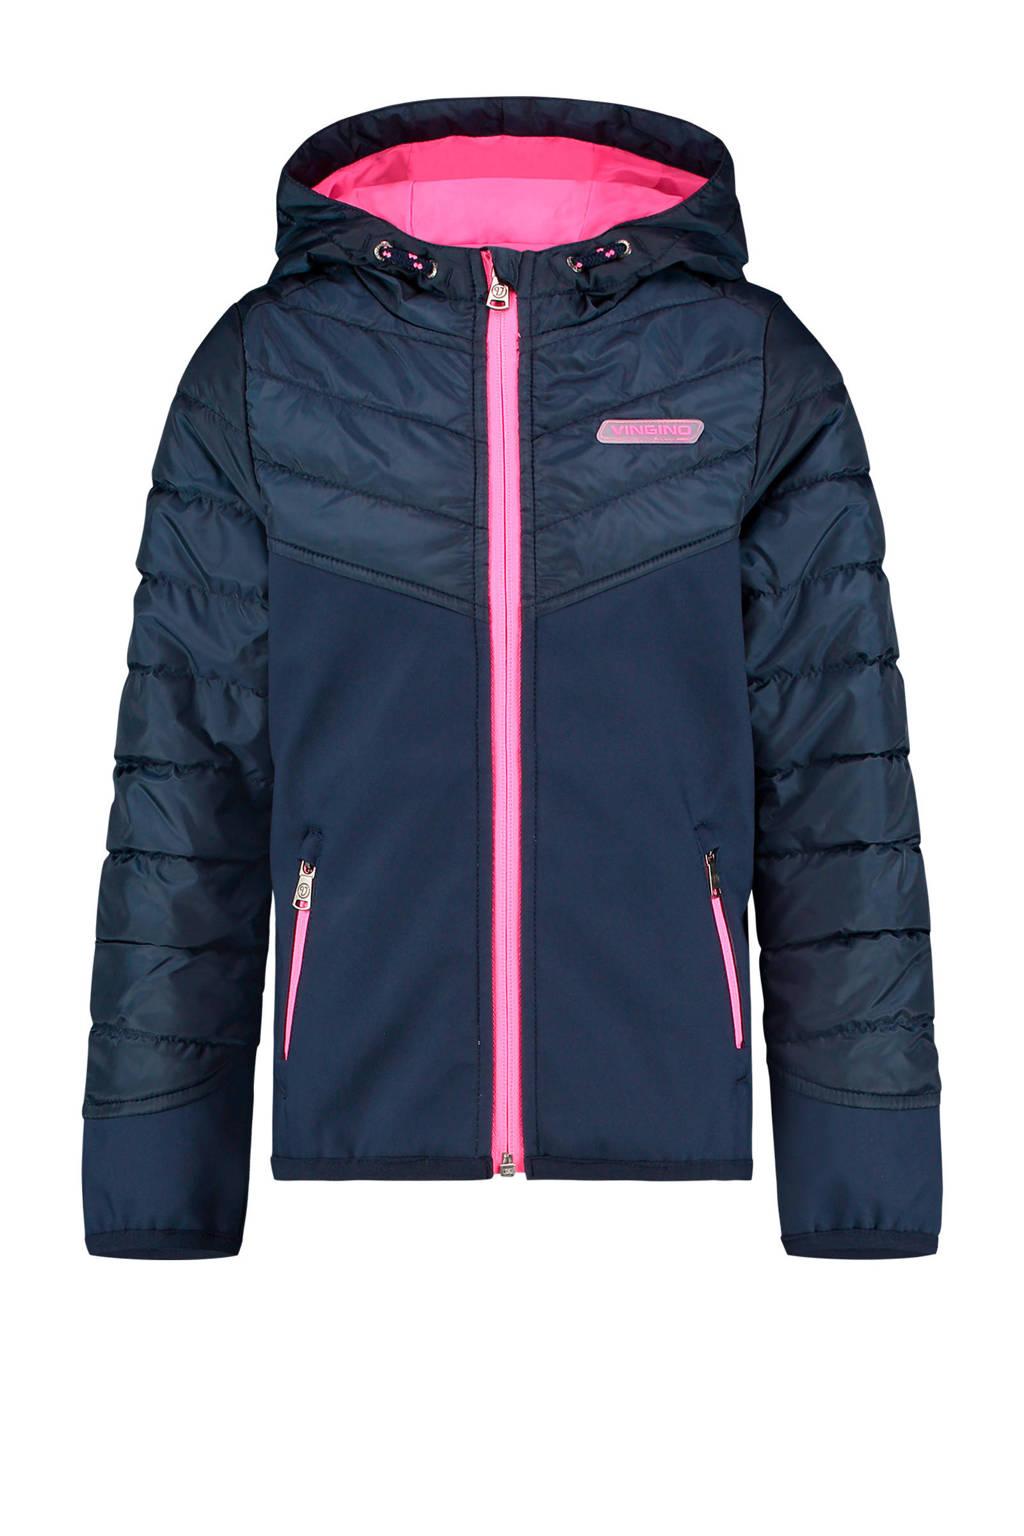 Vingino zomerjas Teraise donkerblauw/roze, Donkerblauw/roze